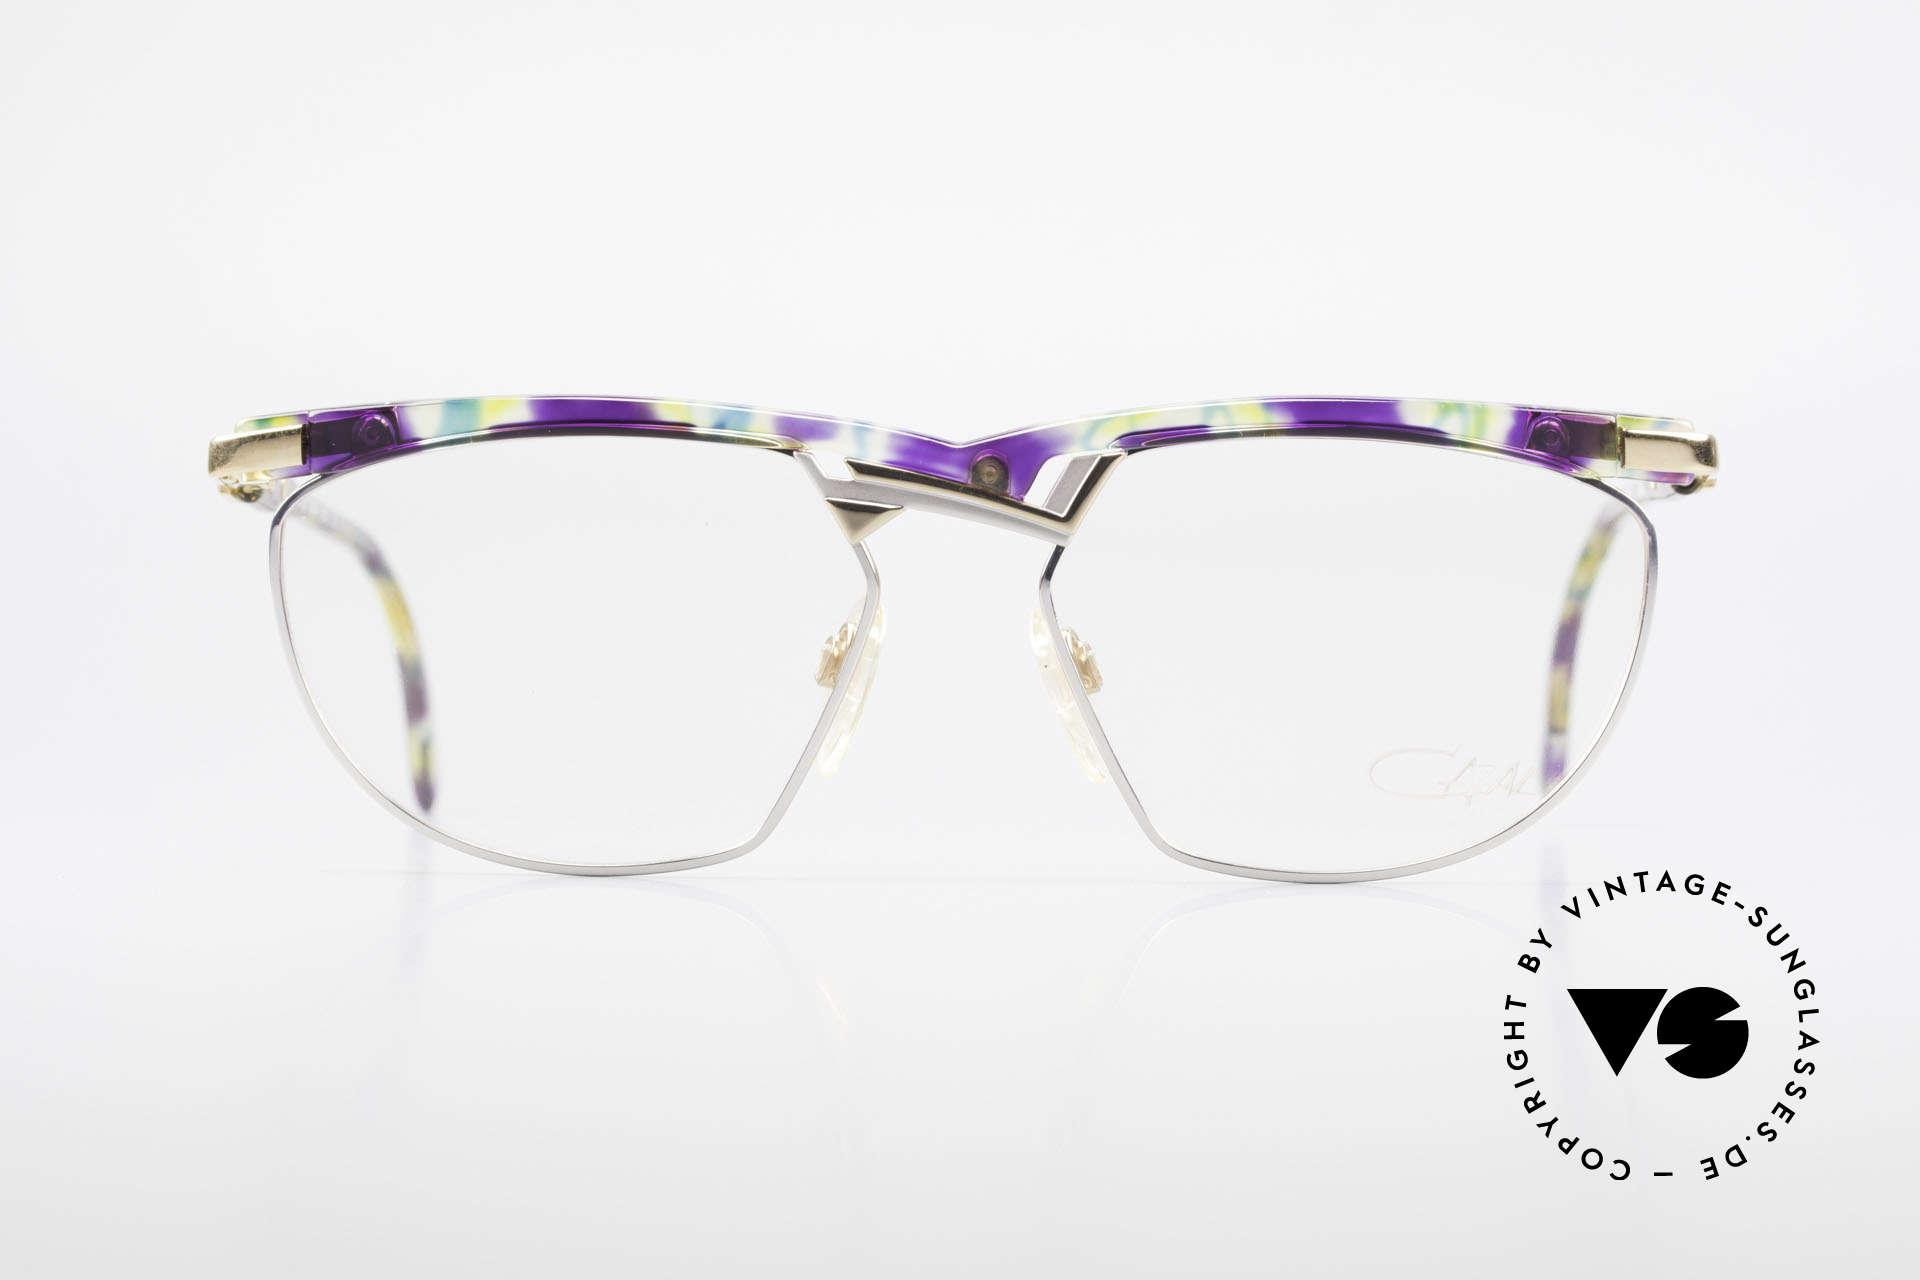 Cazal 252 90's Original True Vintage, fancy combination of colors & materials - true vintage, Made for Men and Women